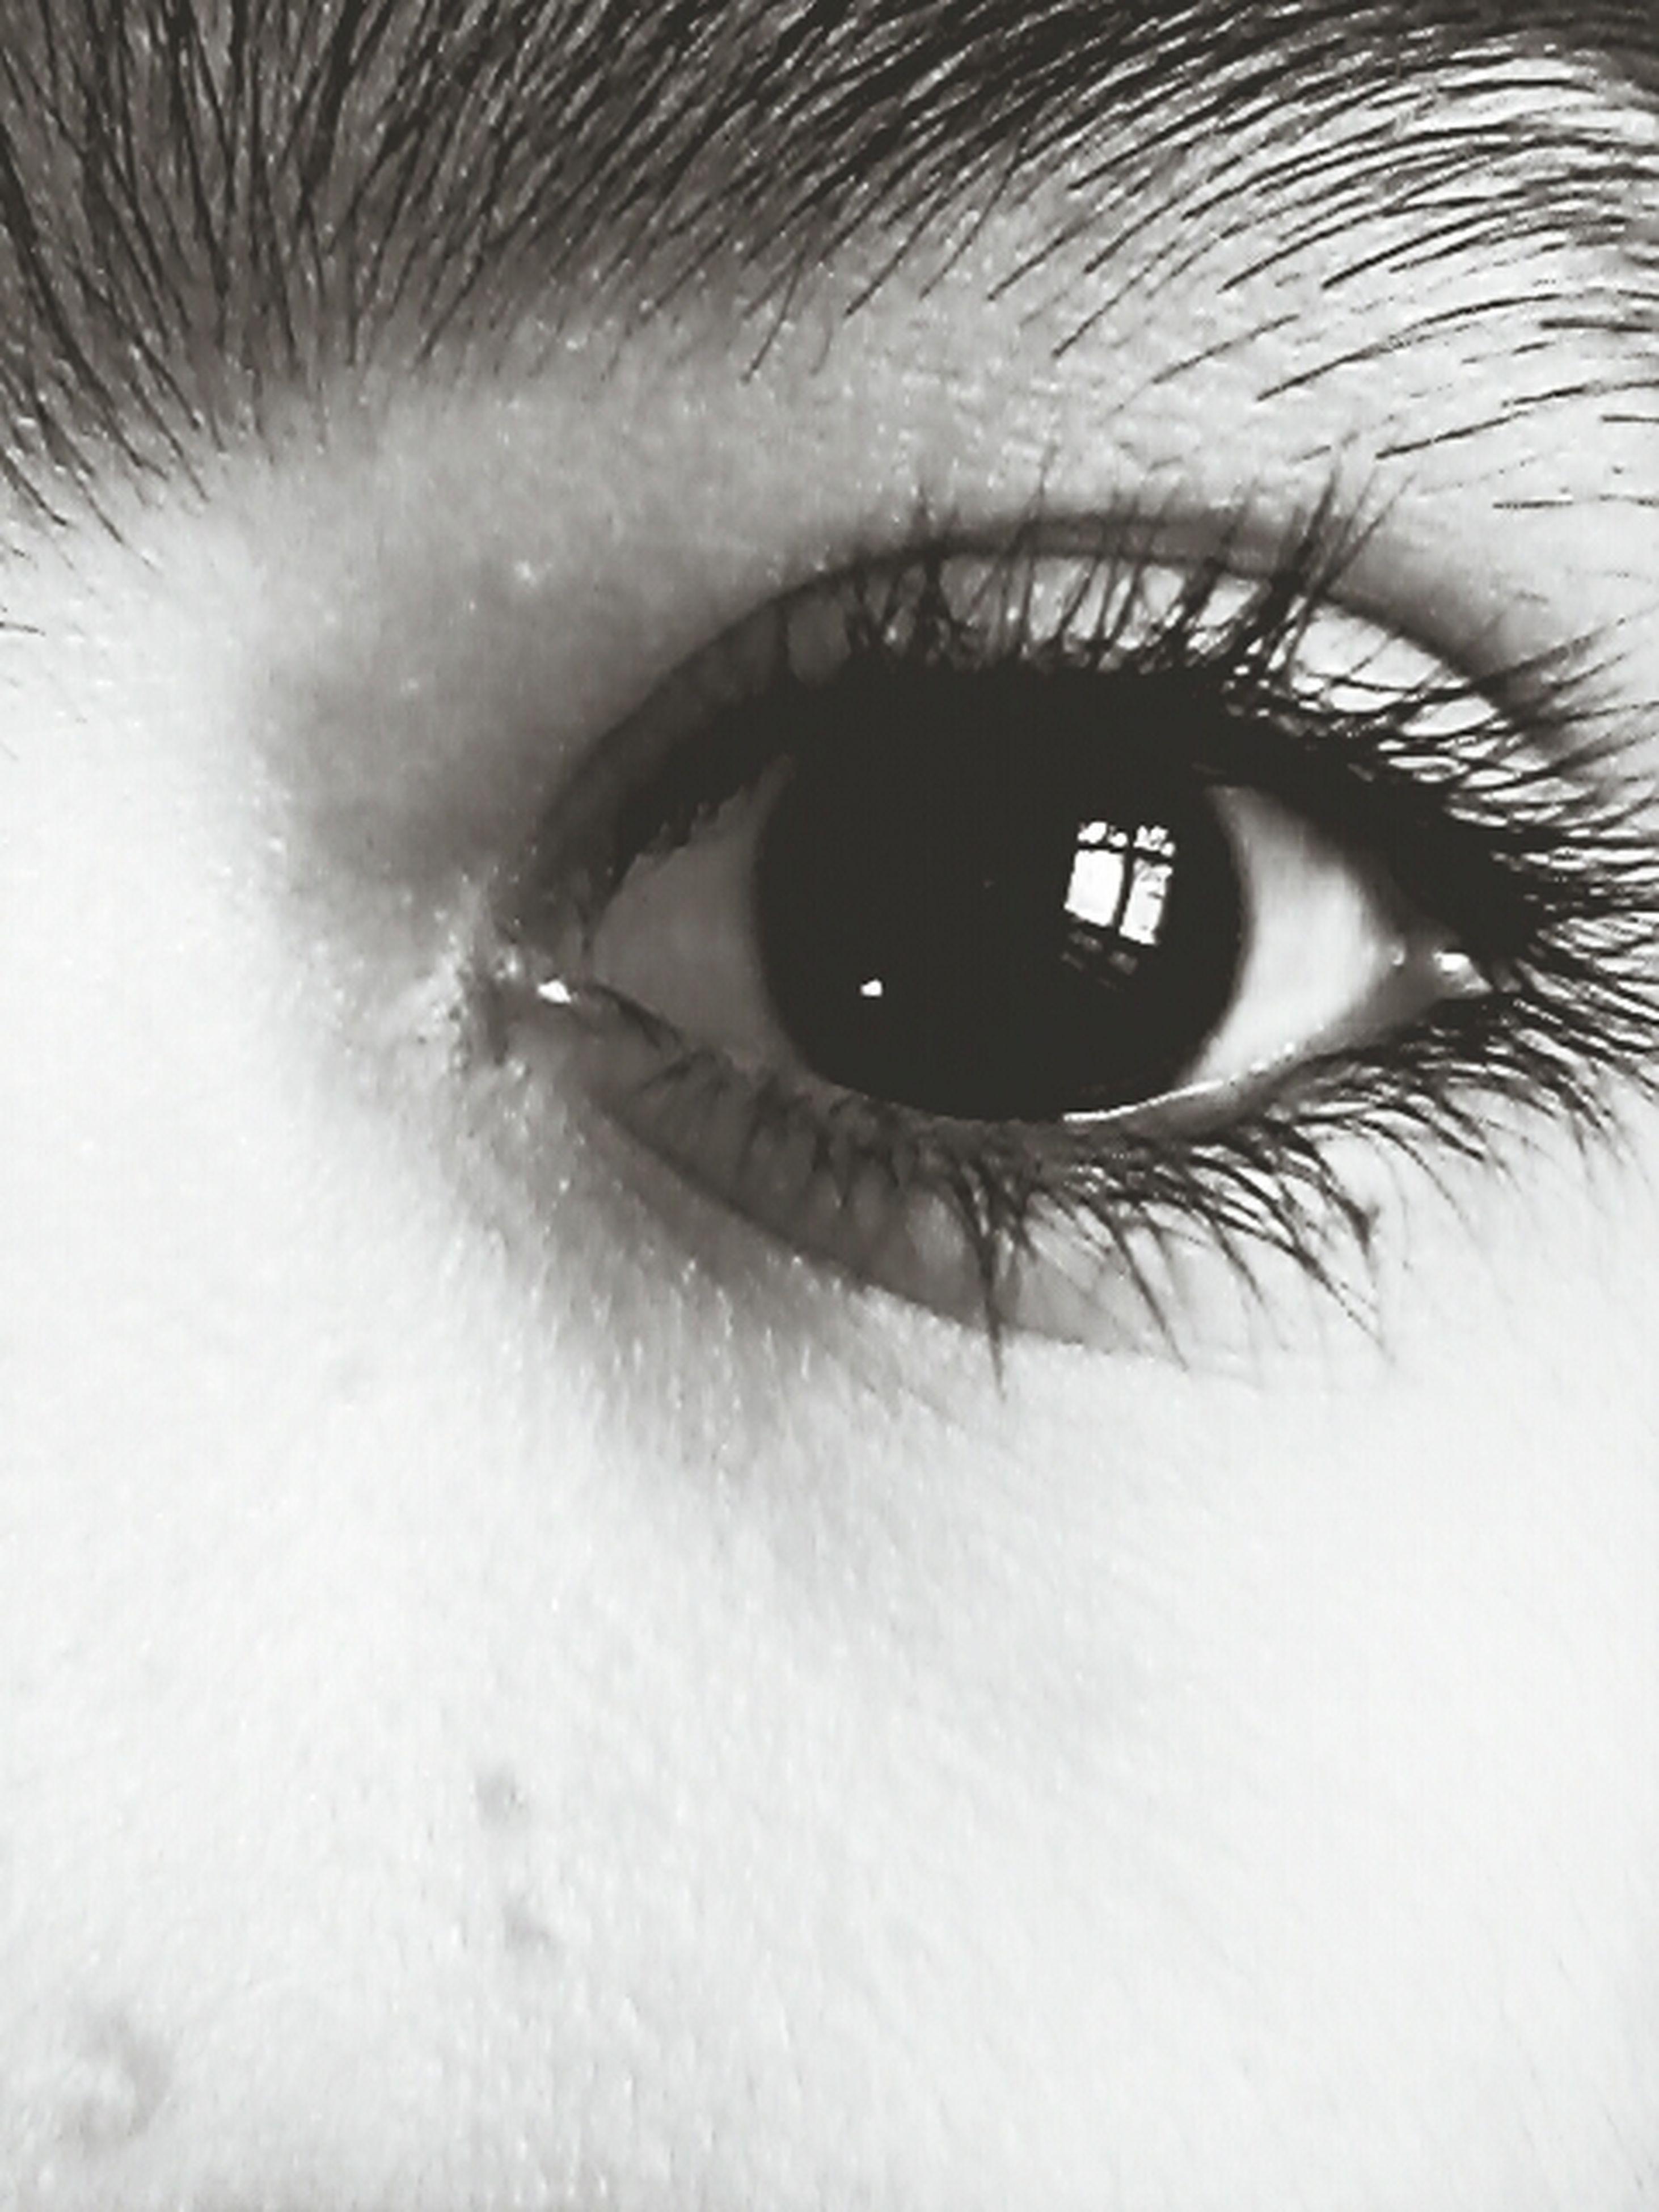 human eye, eyelash, eyesight, close-up, sensory perception, part of, eyeball, looking at camera, extreme close-up, iris - eye, portrait, human skin, human face, extreme close up, unrecognizable person, person, lifestyles